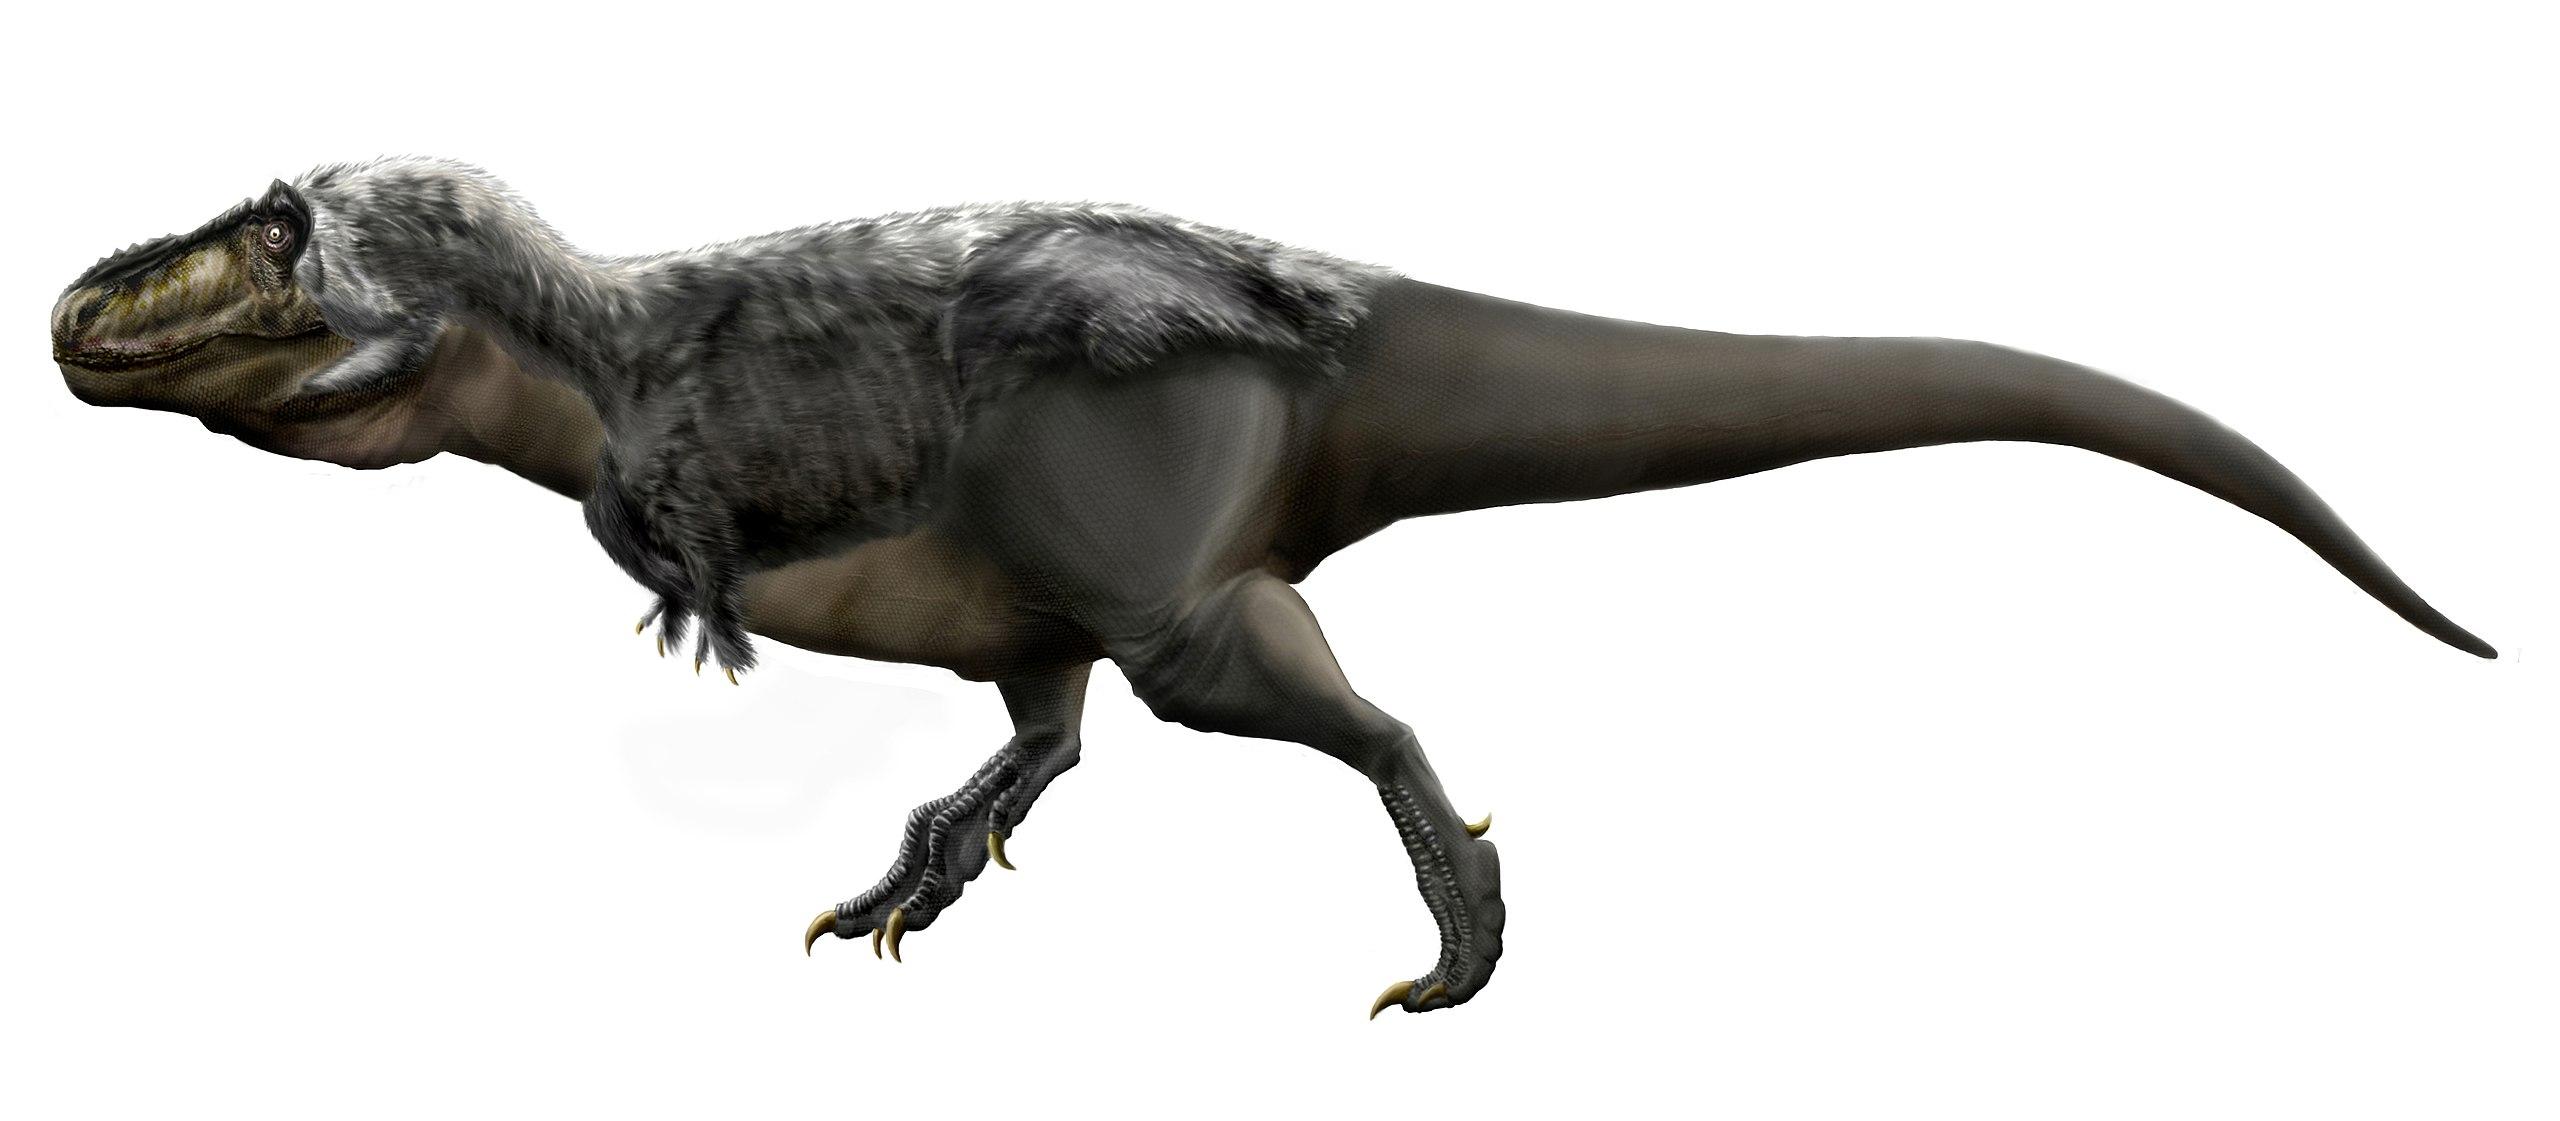 Tyrannosaurus rex by durbed.jpg